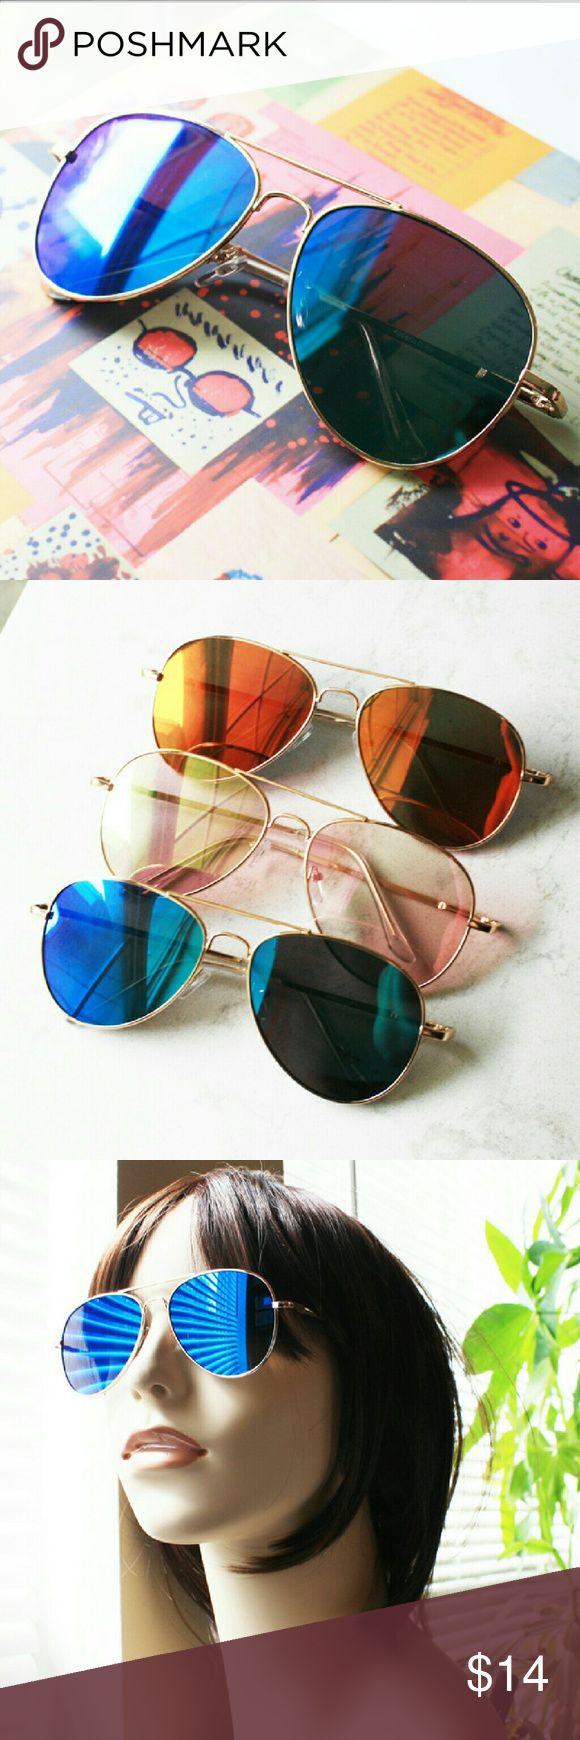 "Fly Girl aviator sunglasses (ocean waves) Gold metal aviator style sunglasses. Blue semi-transparent reflective lens. Lens is 2.25"" wide x 2"" tall Vera Lyndon  Accessories Sunglasses"